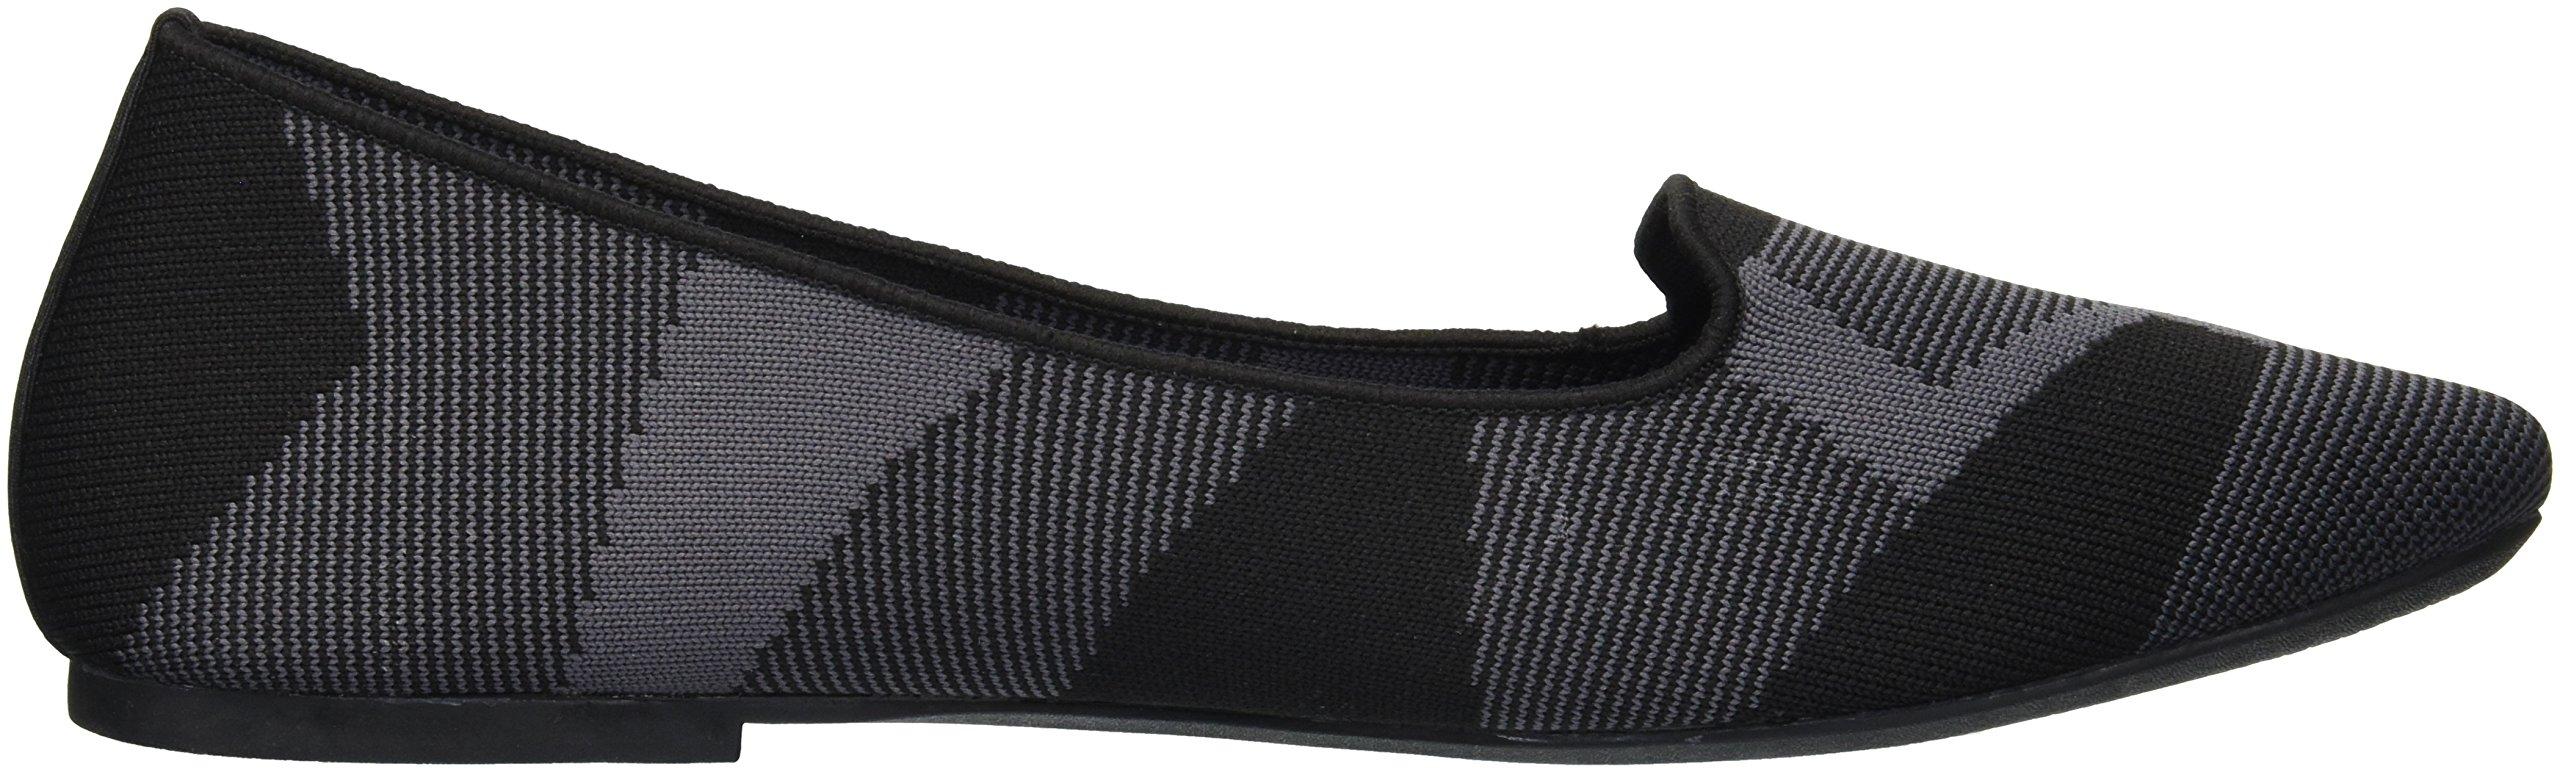 Skechers Women's Cleo-Sherlock-Engineered Knit Loafer Skimmer Ballet Flat, Black, 6.5 M US by Skechers (Image #6)